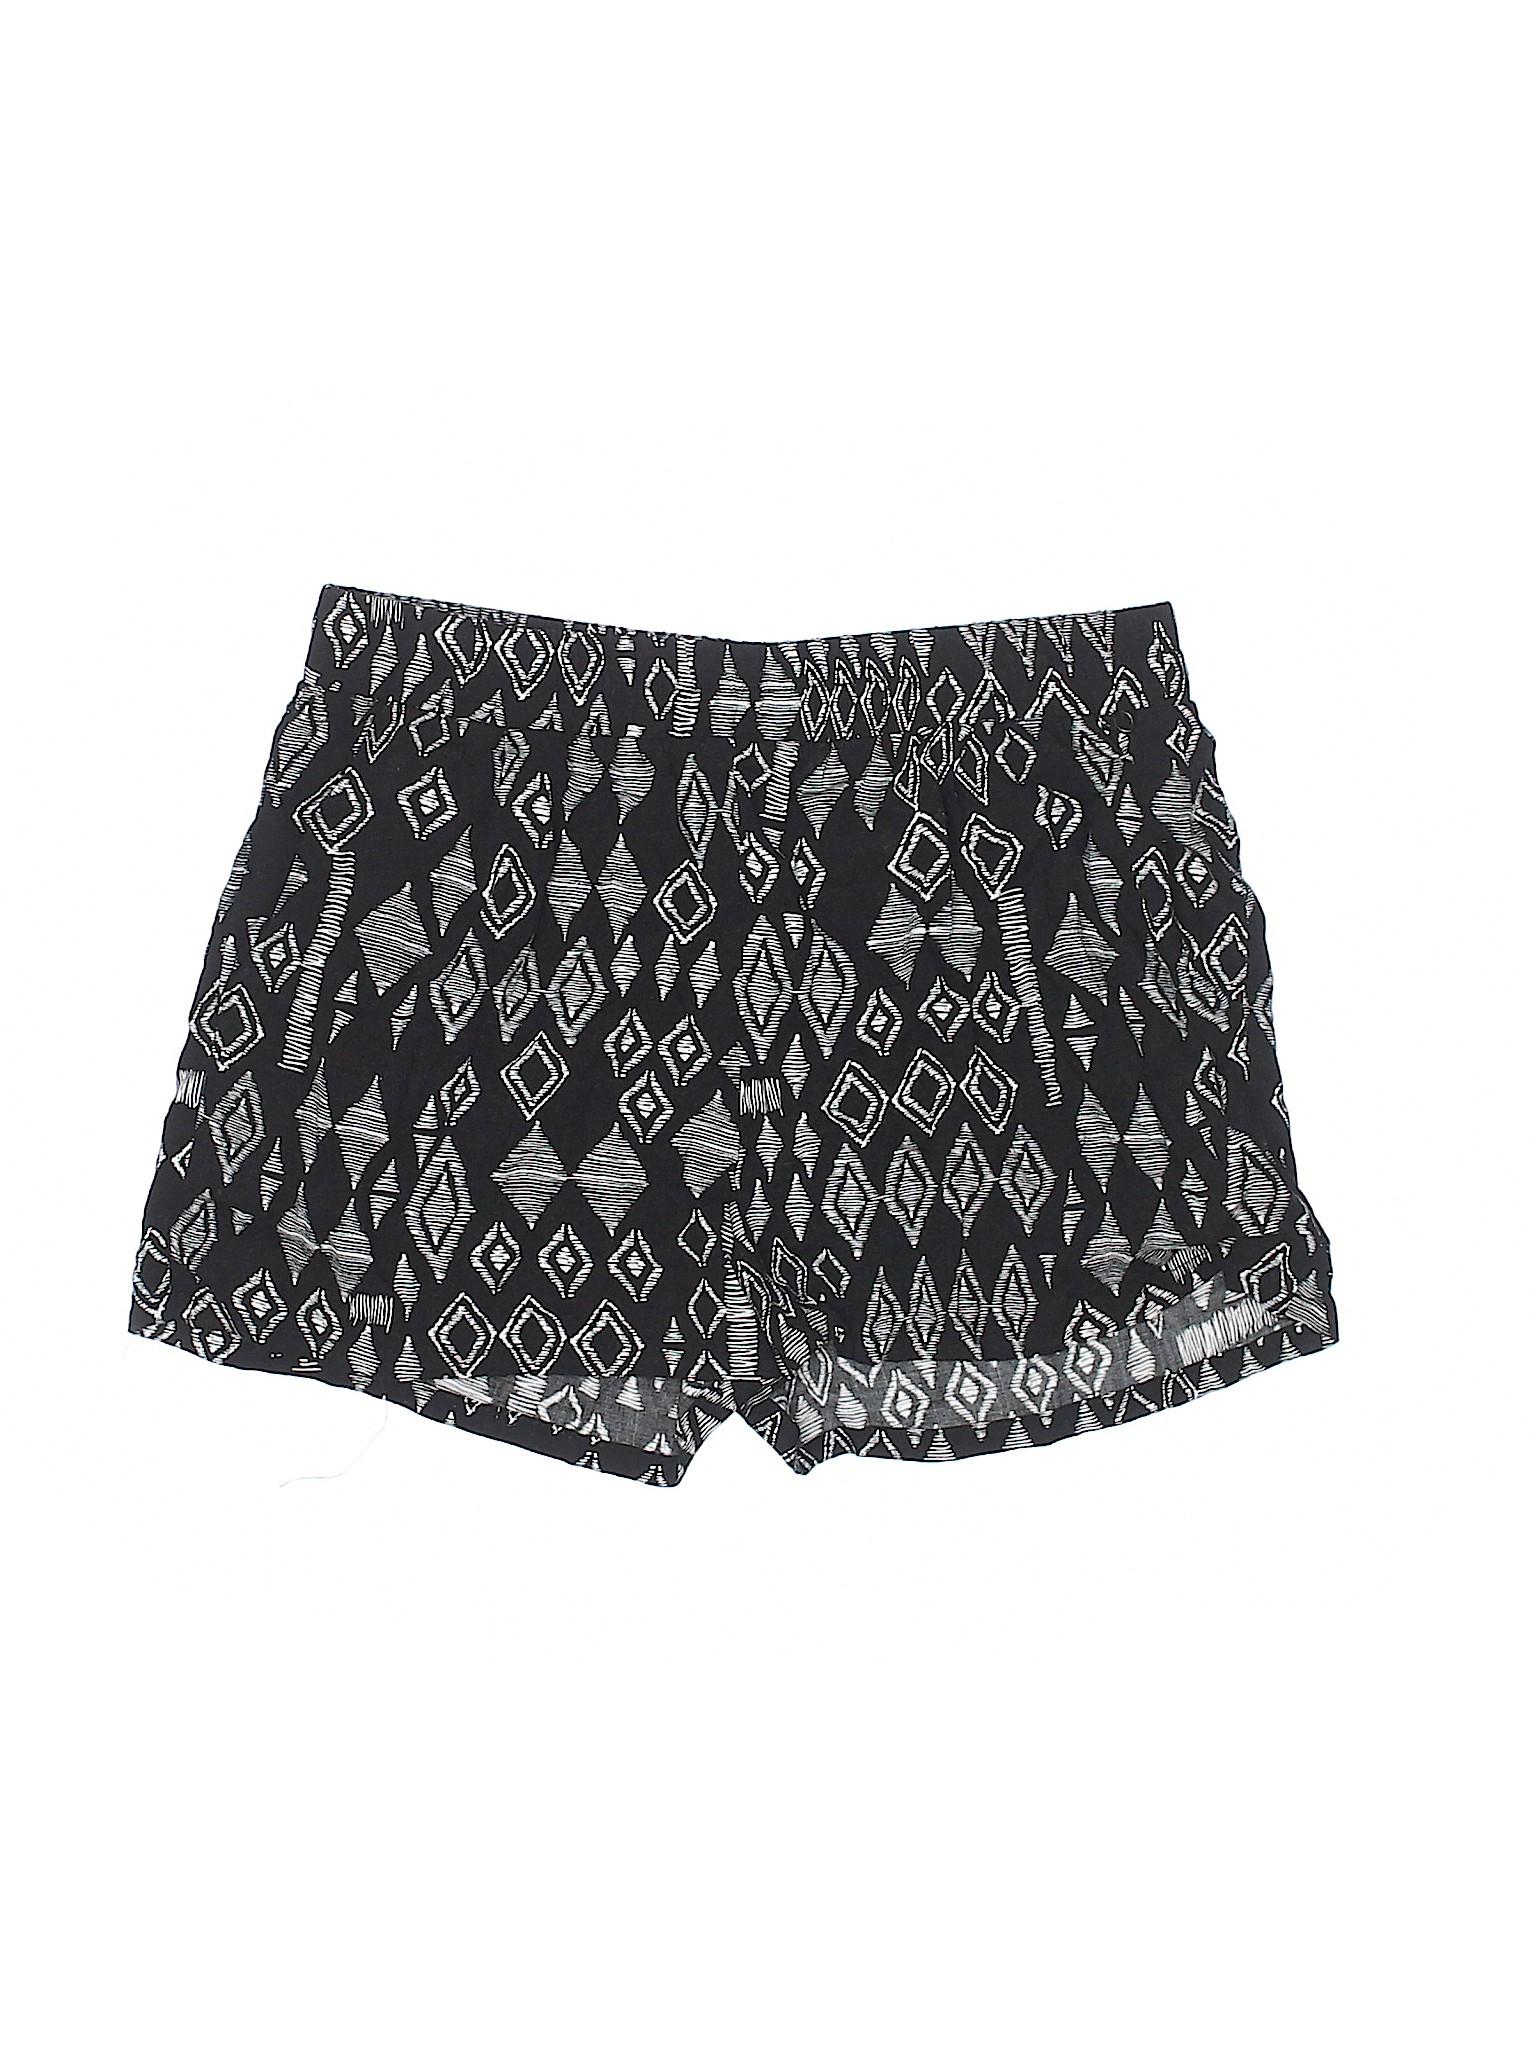 Boutique Shorts Braeve Boutique Boutique Shorts Braeve Shorts Braeve Boutique 8EwZqHSn